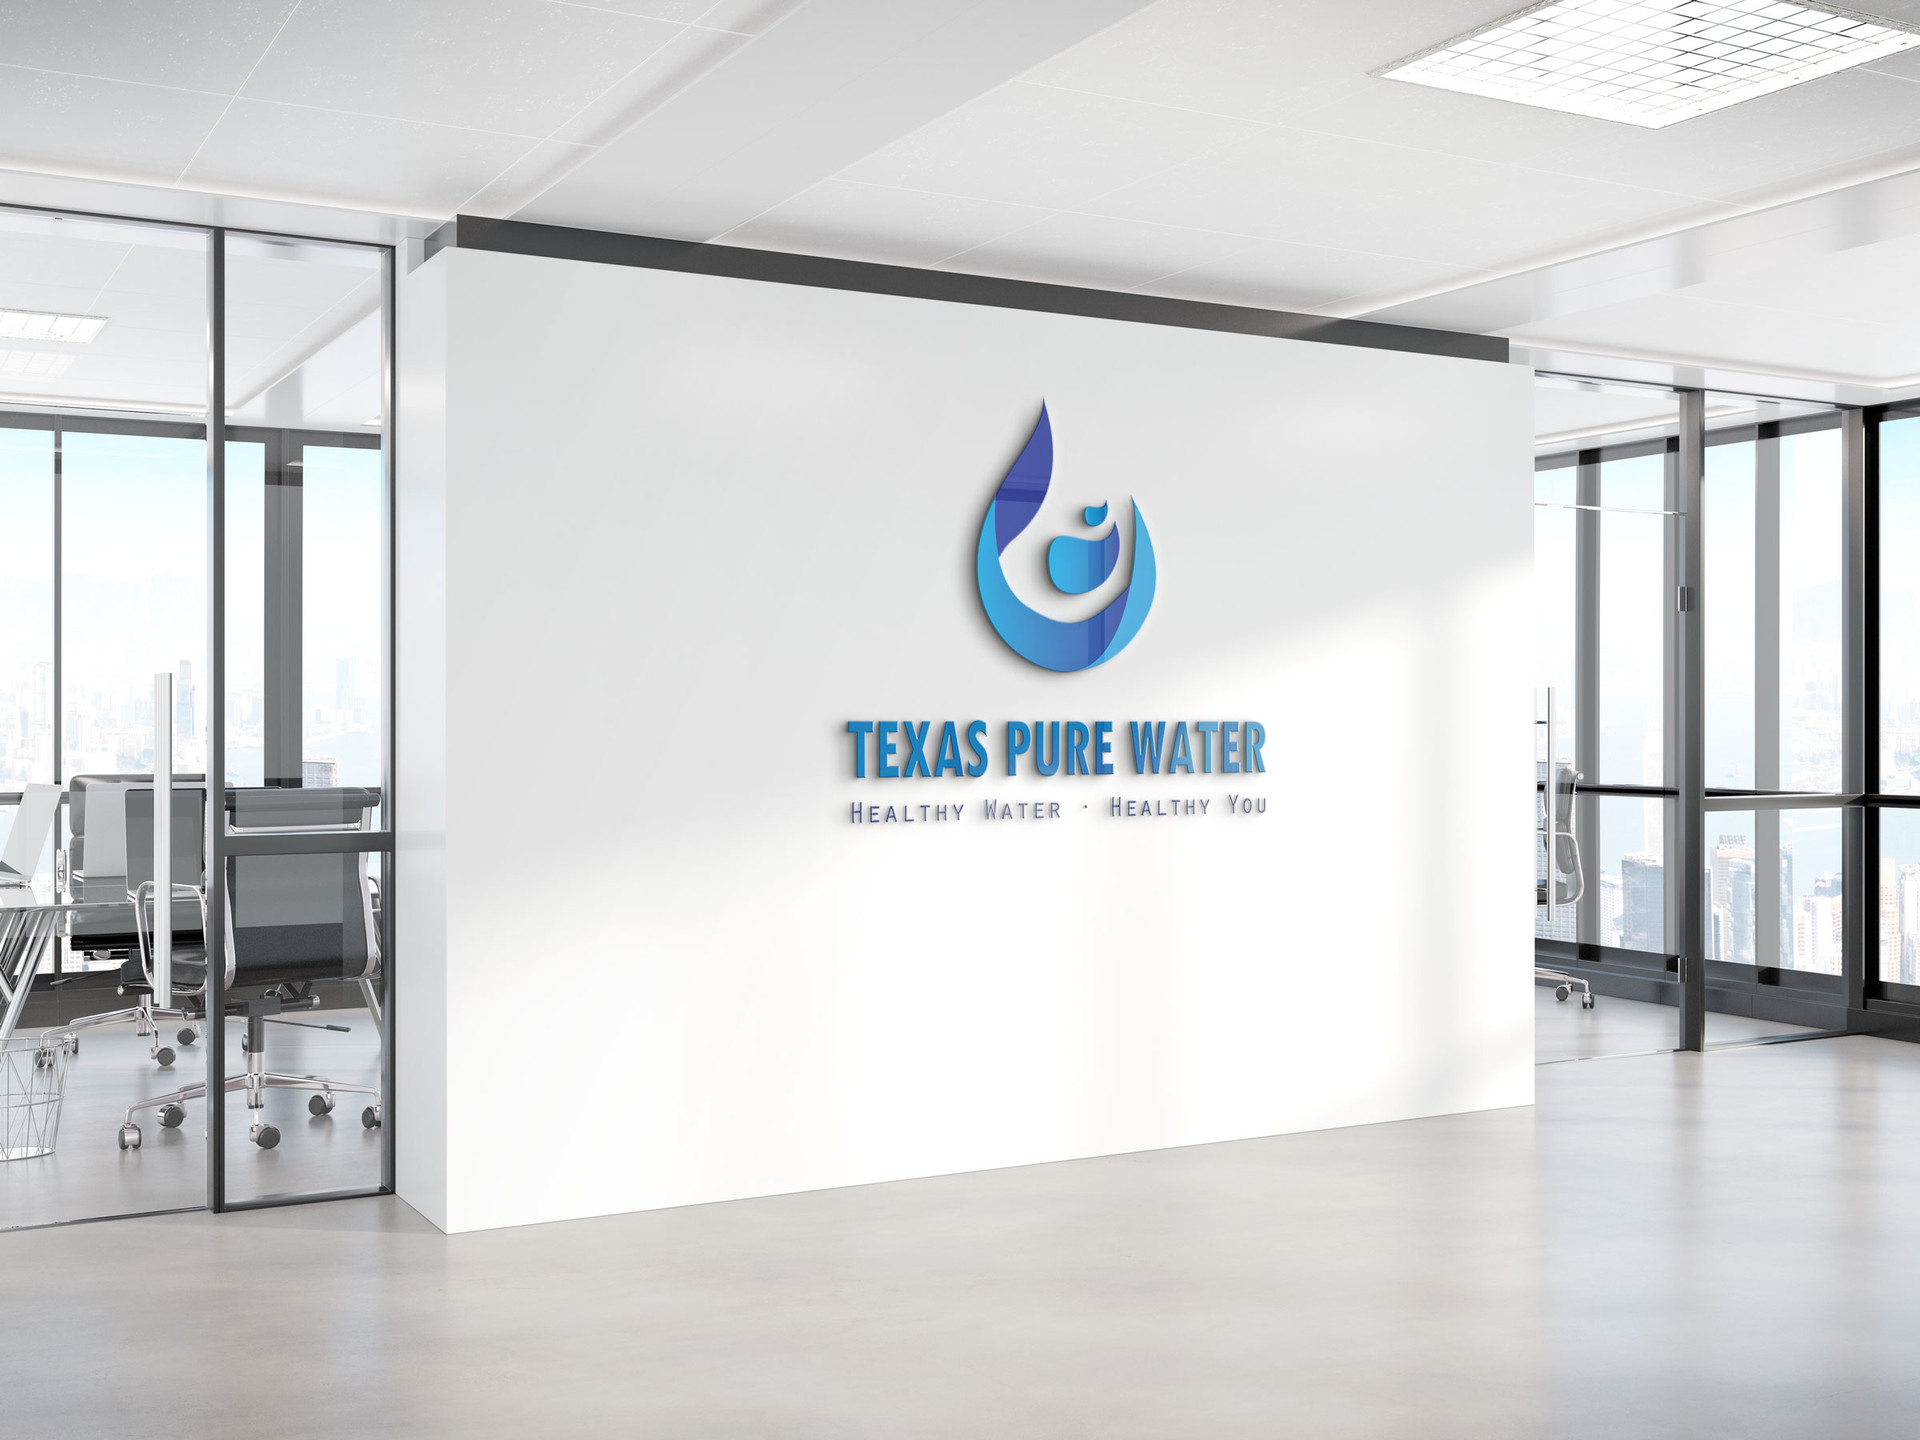 Texas-Pure-Water-wall.jpg